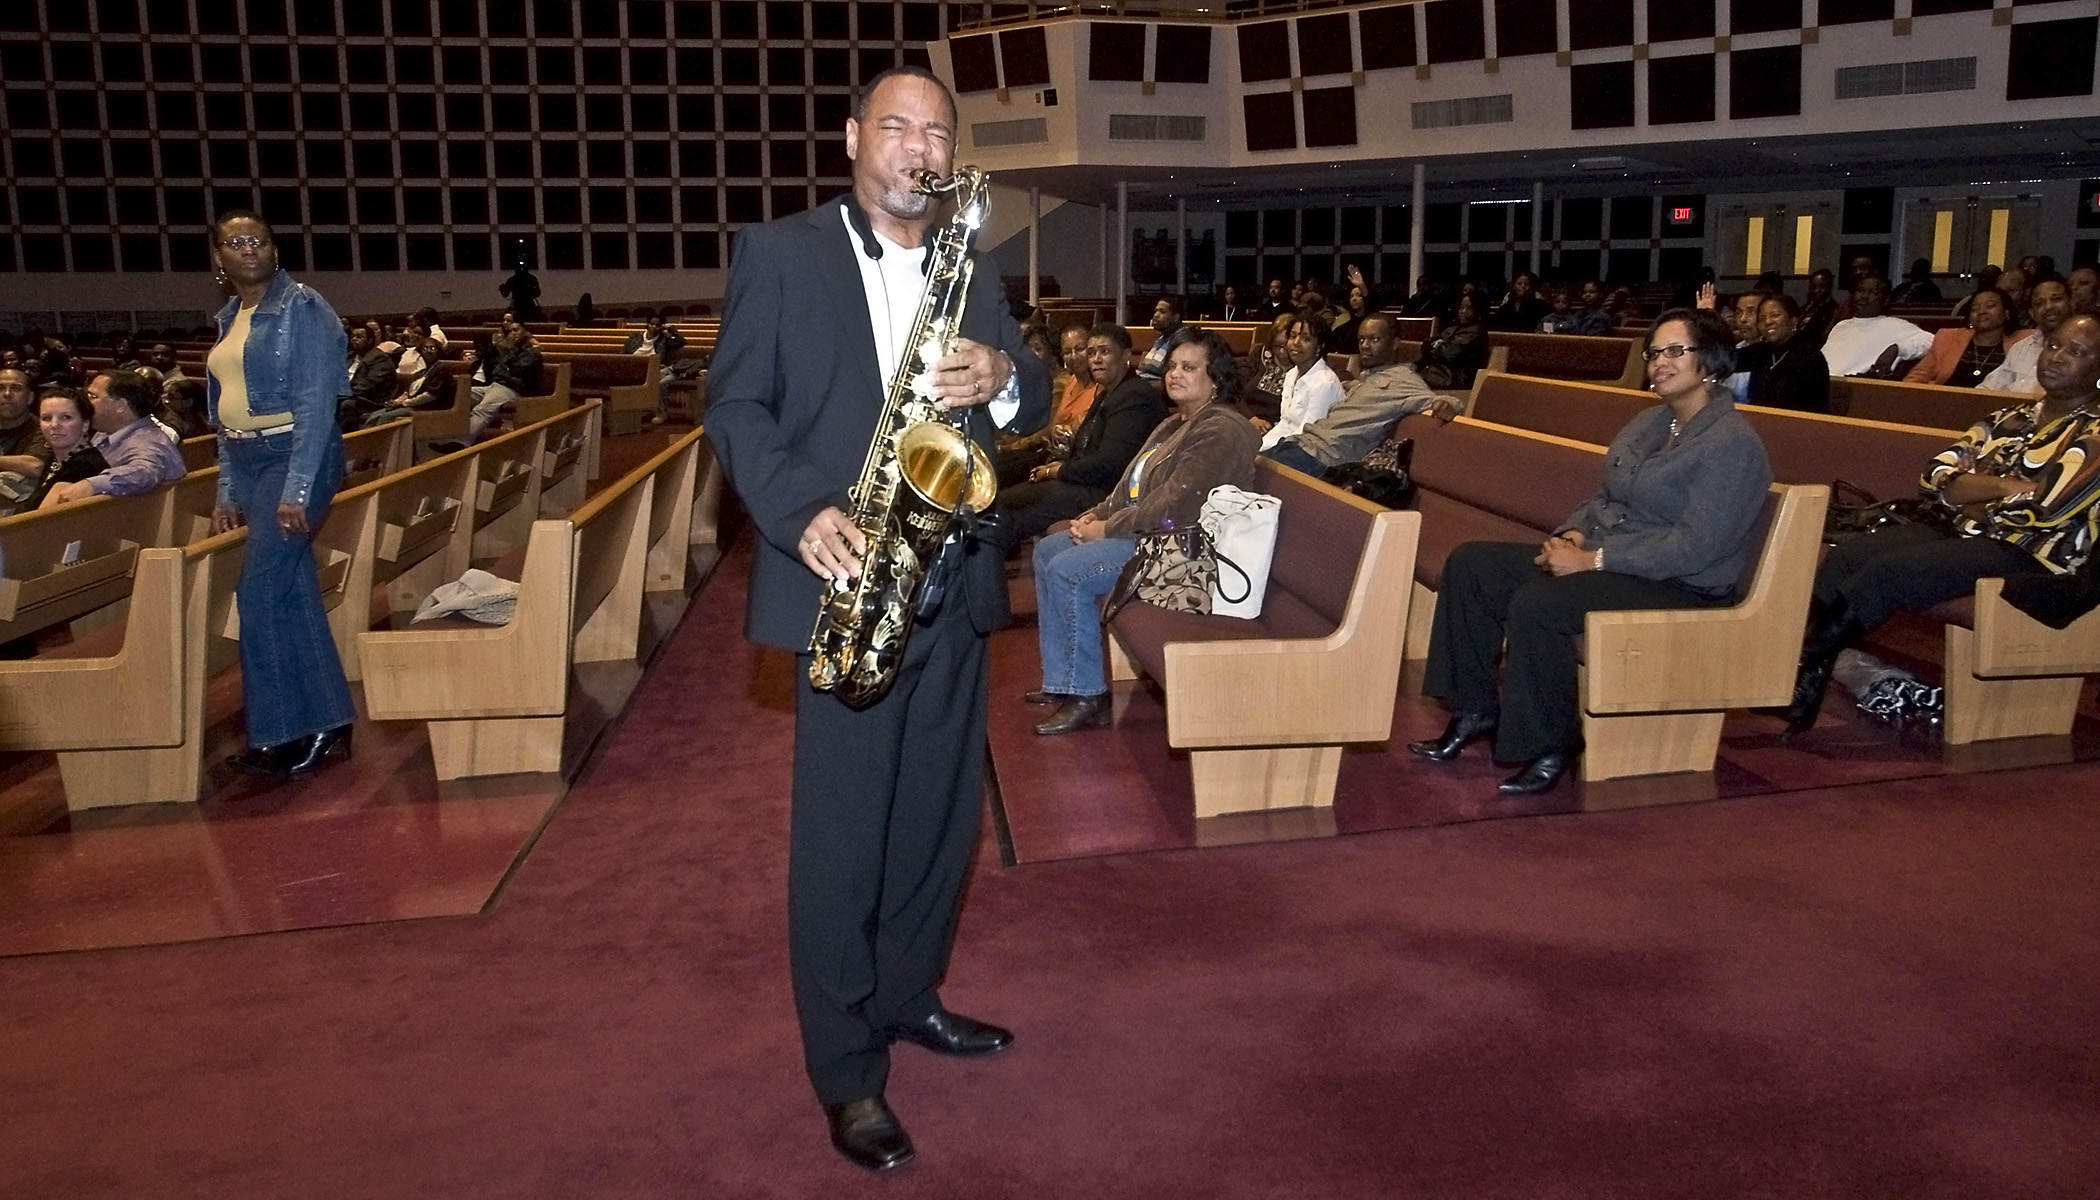 Kirk Whalum at Reid Temple (MD)